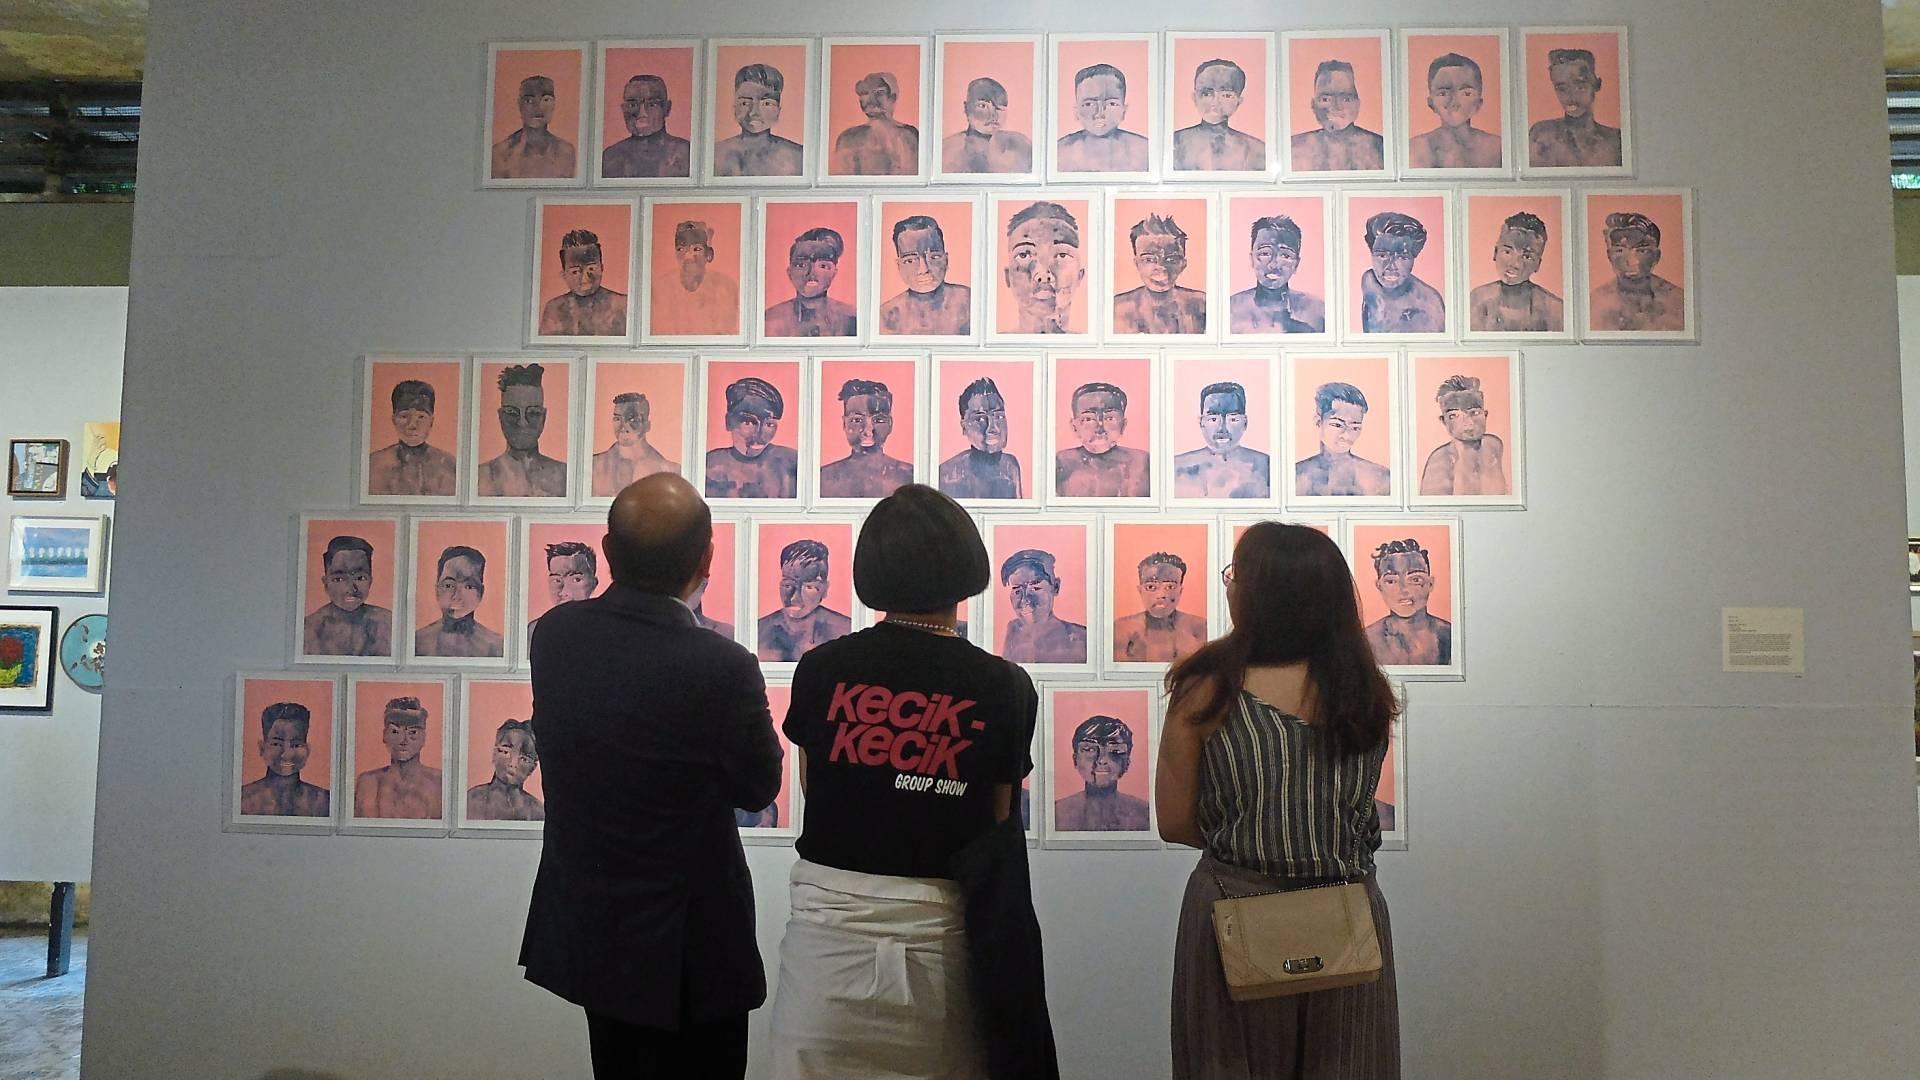 Visitors taking a look at 'Metamorfosis' by artist Tang Tze Lye at 'The Kecik Kecik Group Show Finale' at the Hin Bus Depot in October 2019. Photo: Andrea Filmer